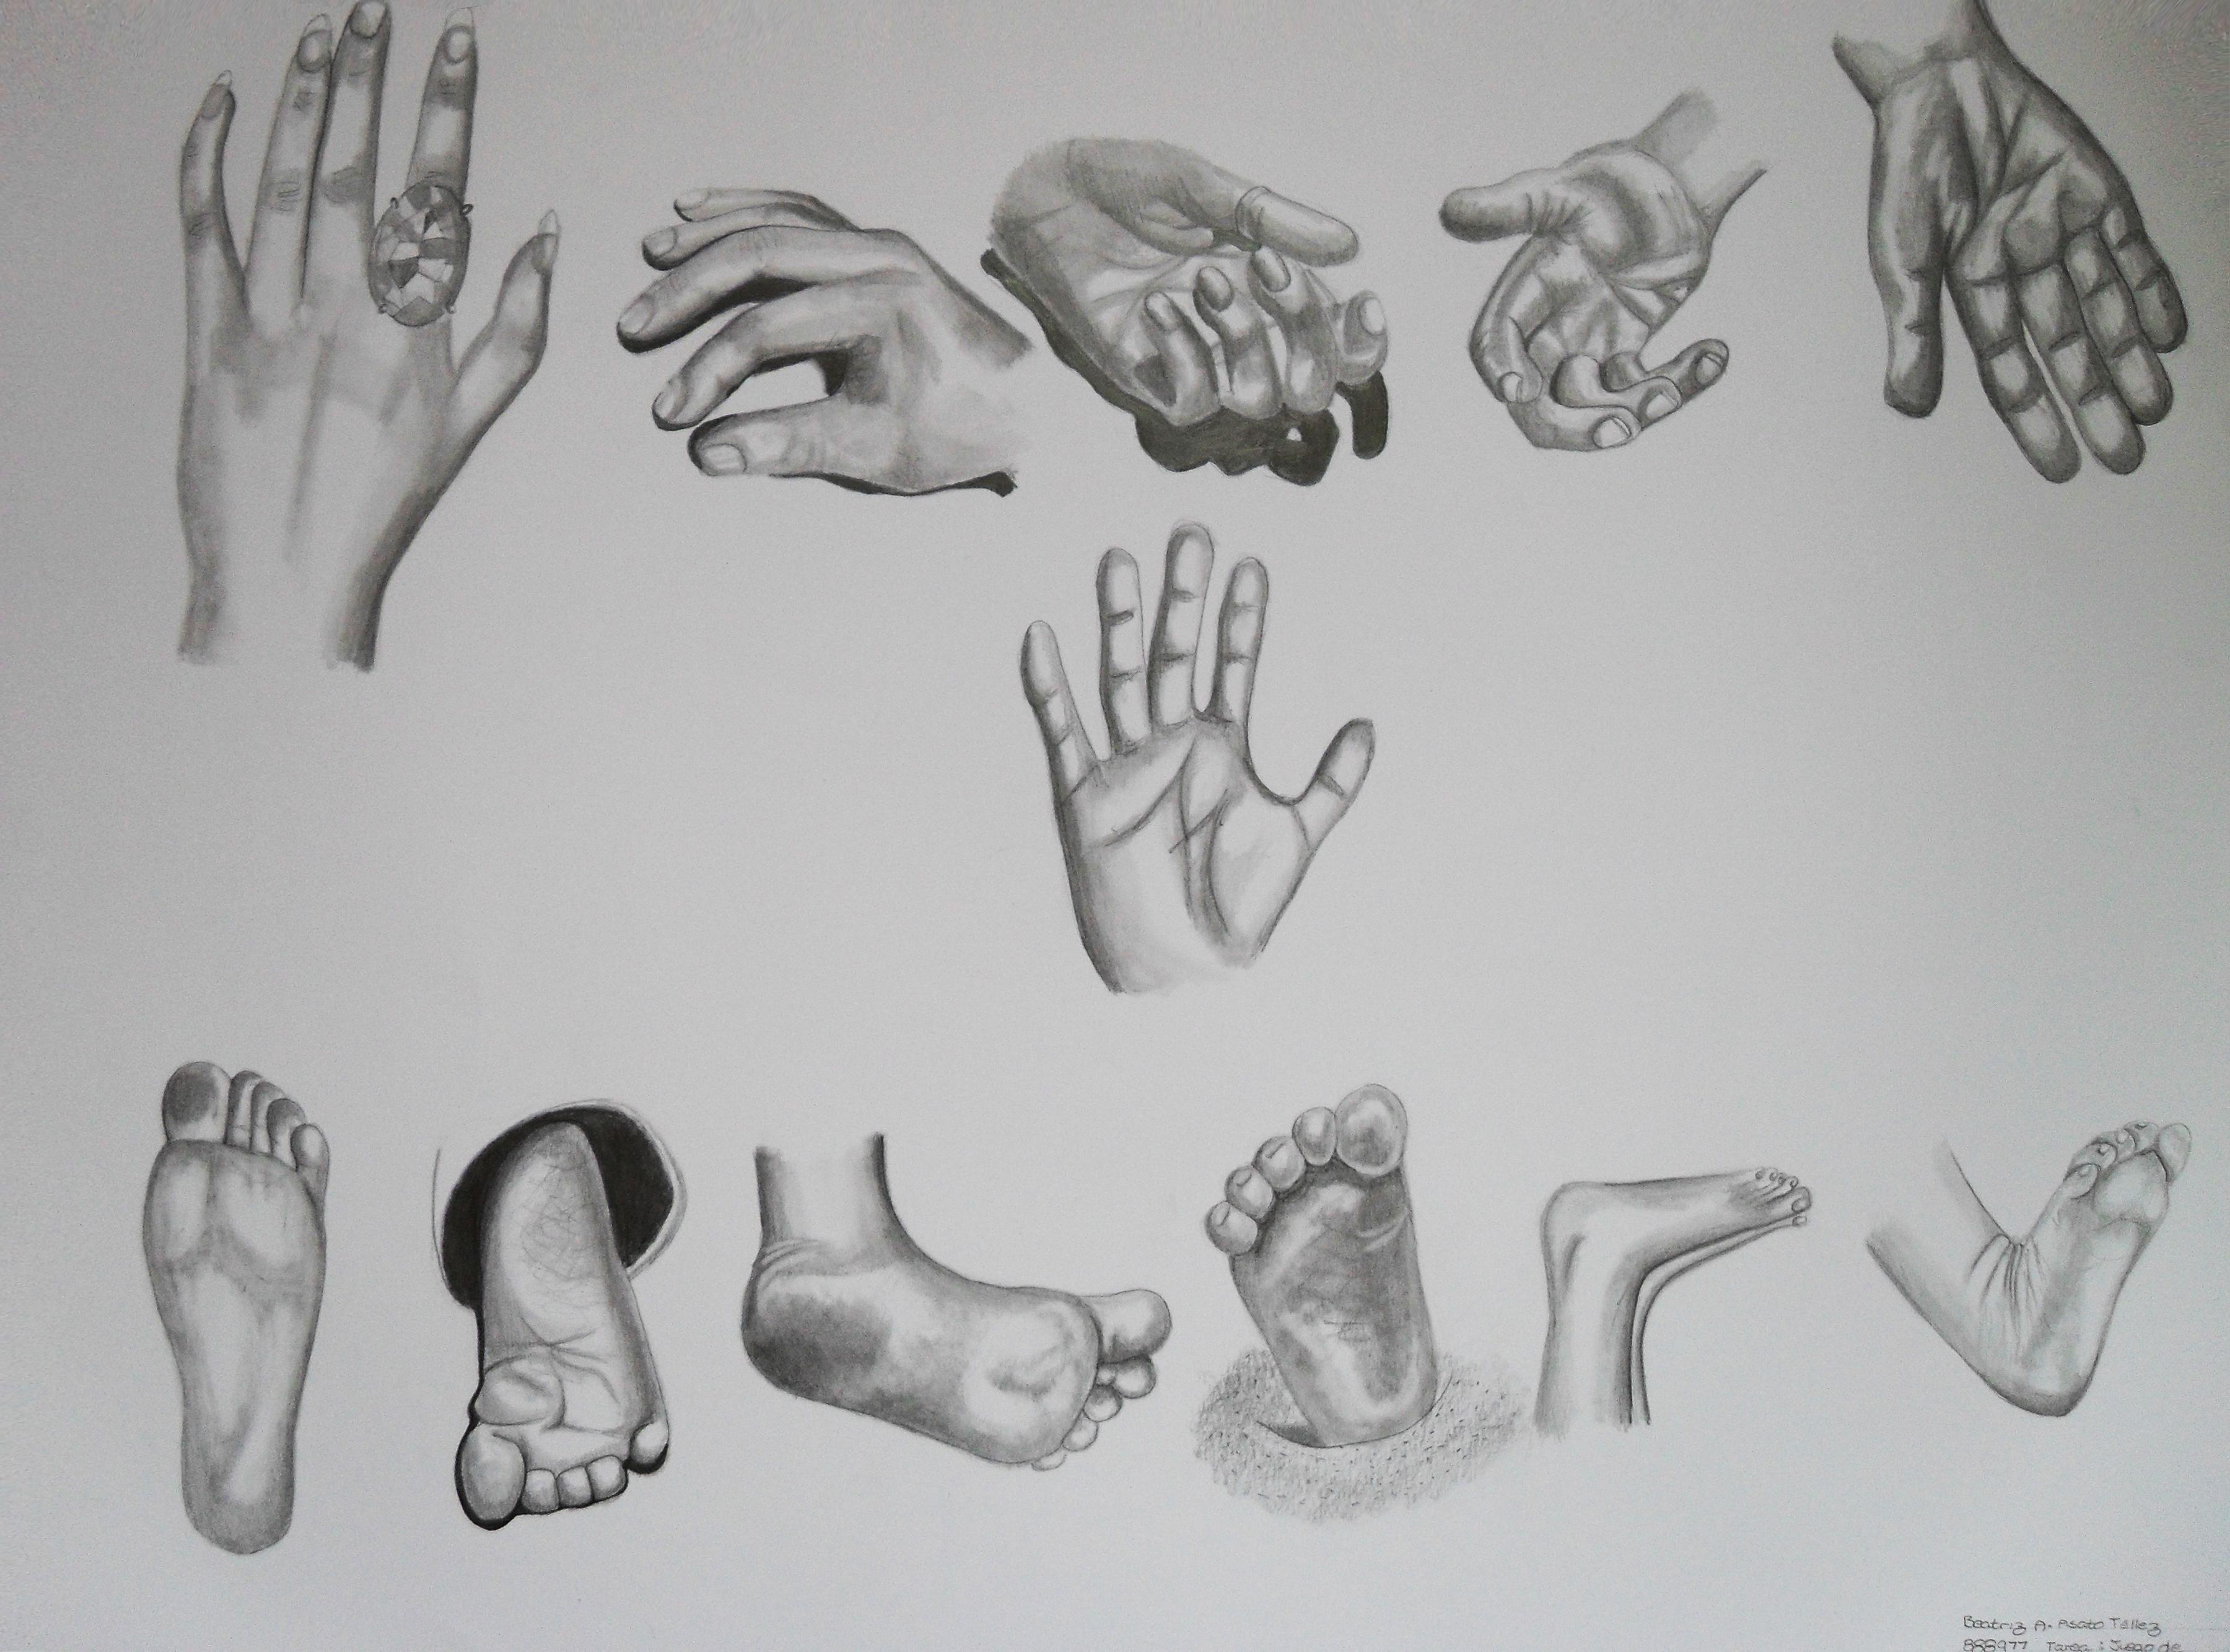 Serie de Manos y Pies Dibujo a Lapiz  Beatriz Asato